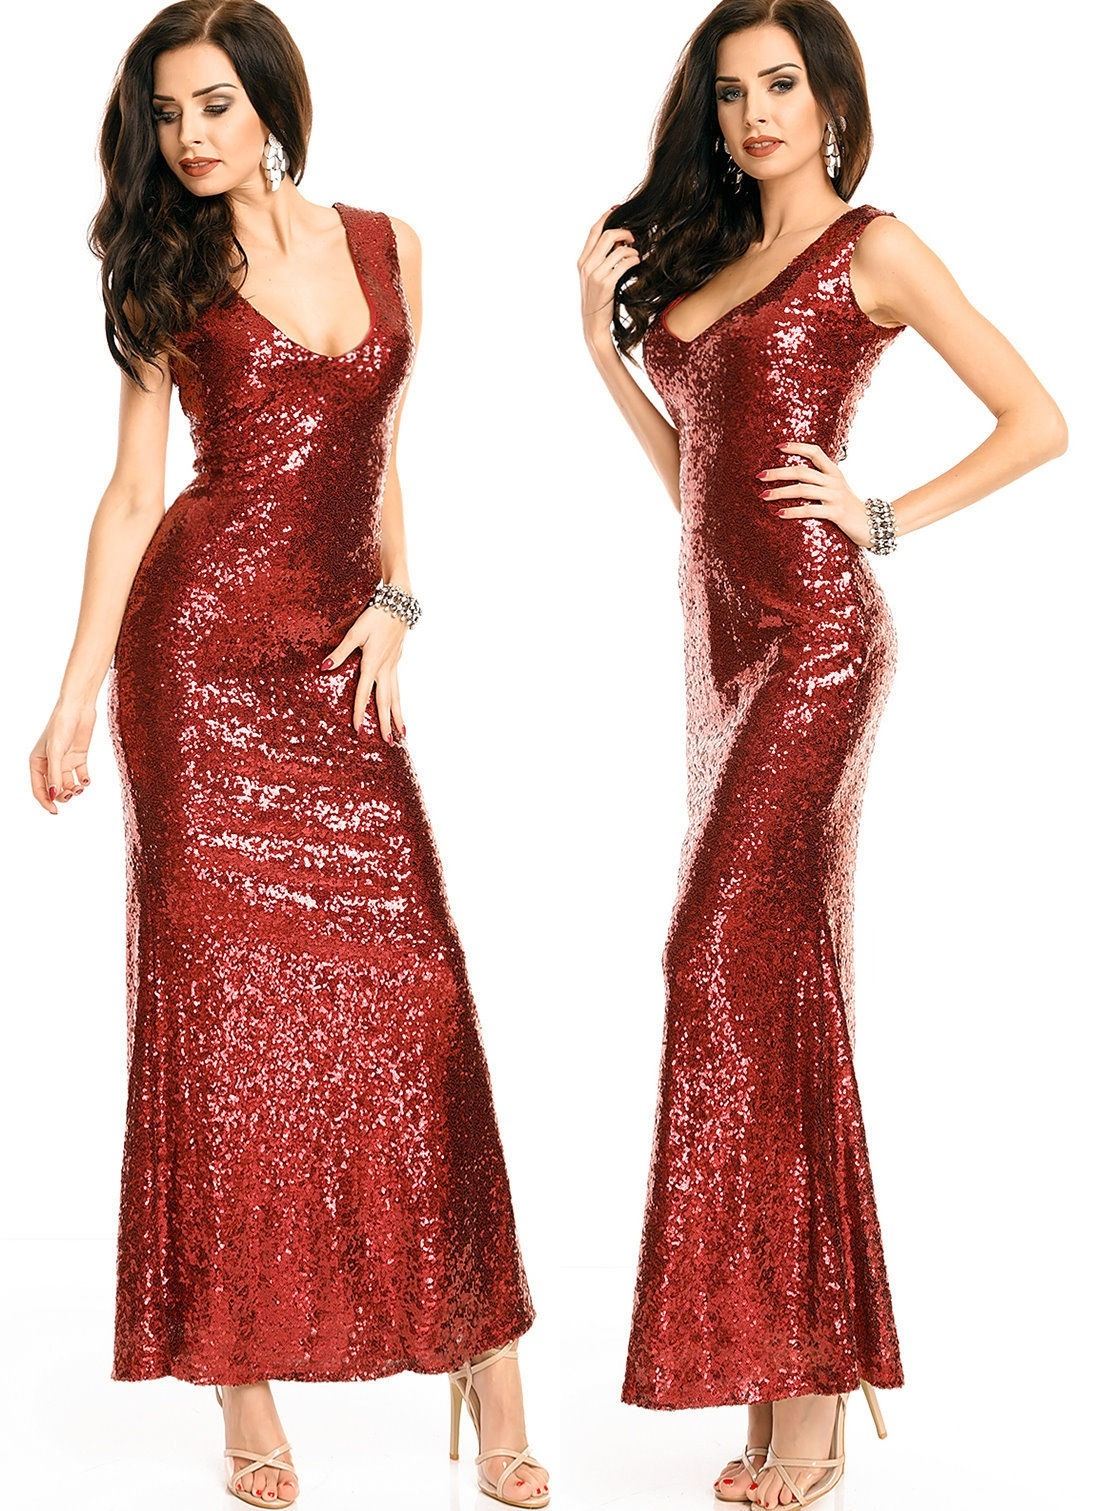 Formal Genial Abendkleid Rot Glitzer DesignFormal Perfekt Abendkleid Rot Glitzer Stylish